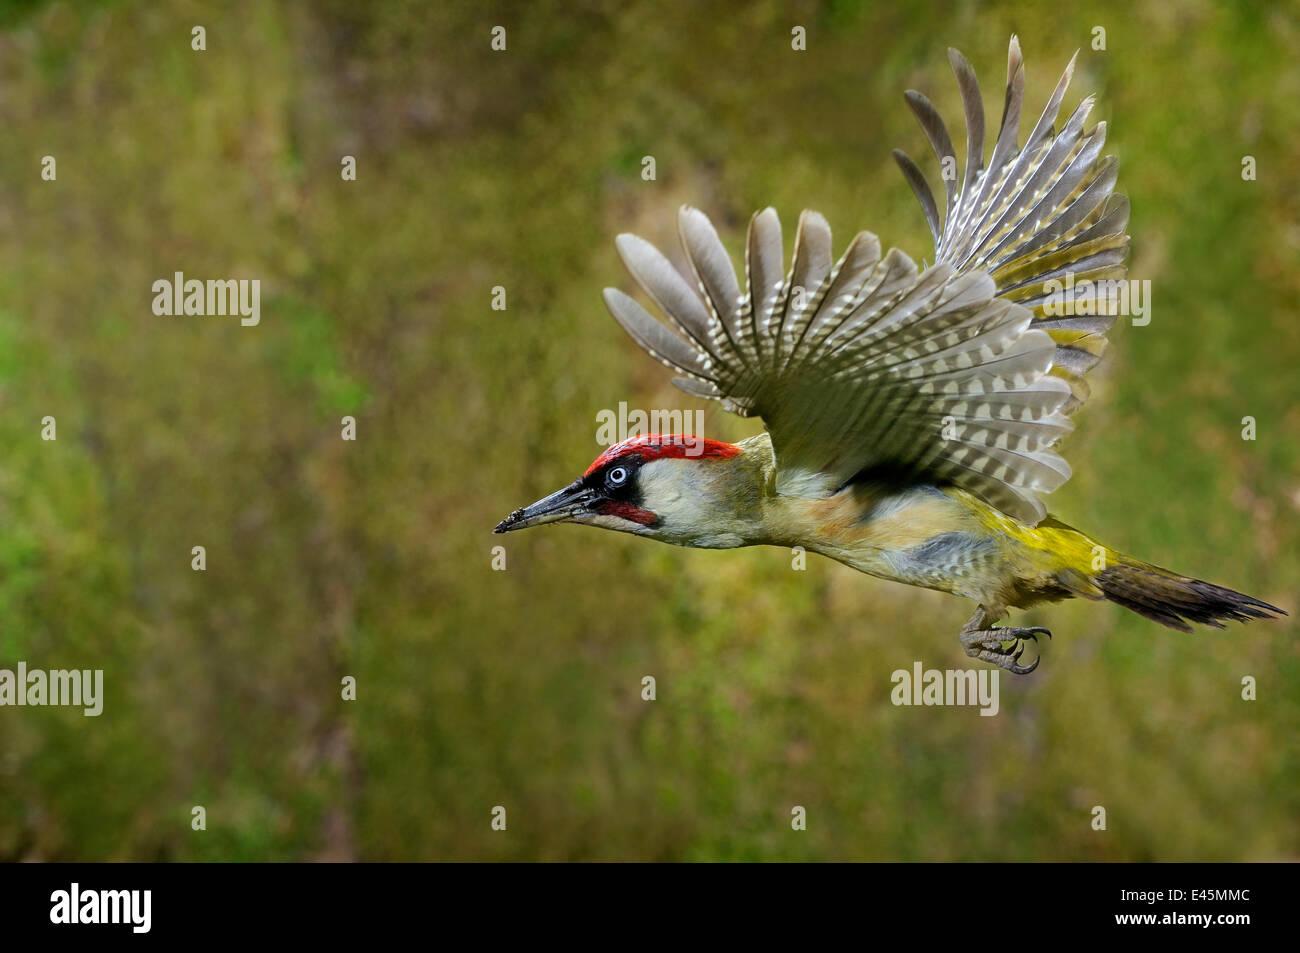 Green woodpecker {Picus viridis} male in flight, Lorraine, France - Stock Image